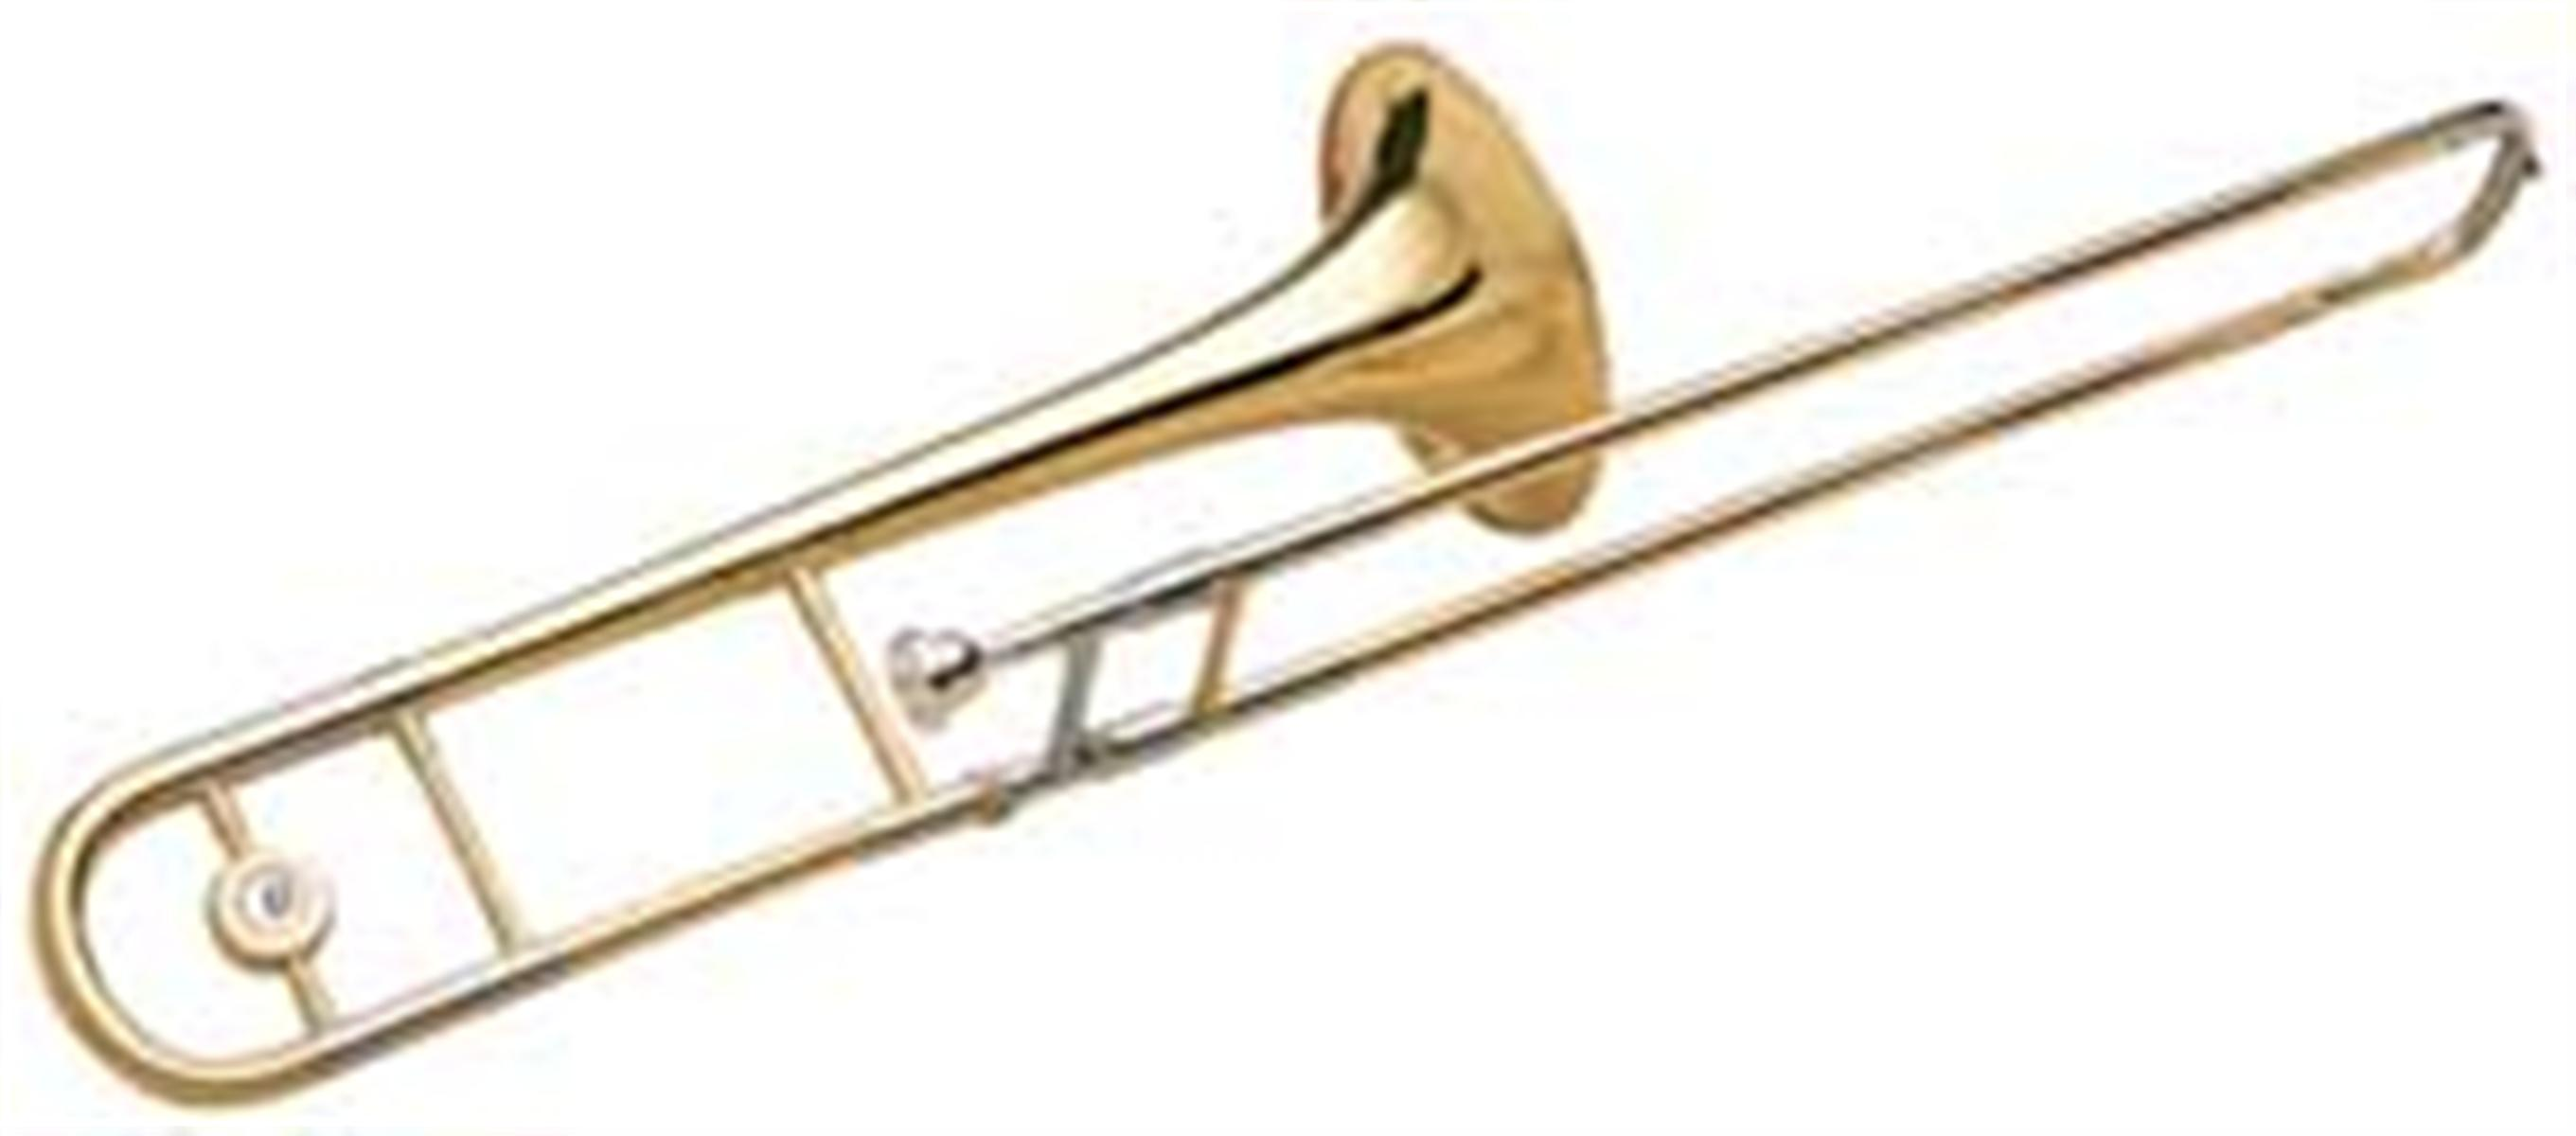 Panda free images tromboneclipart. Trombone clipart